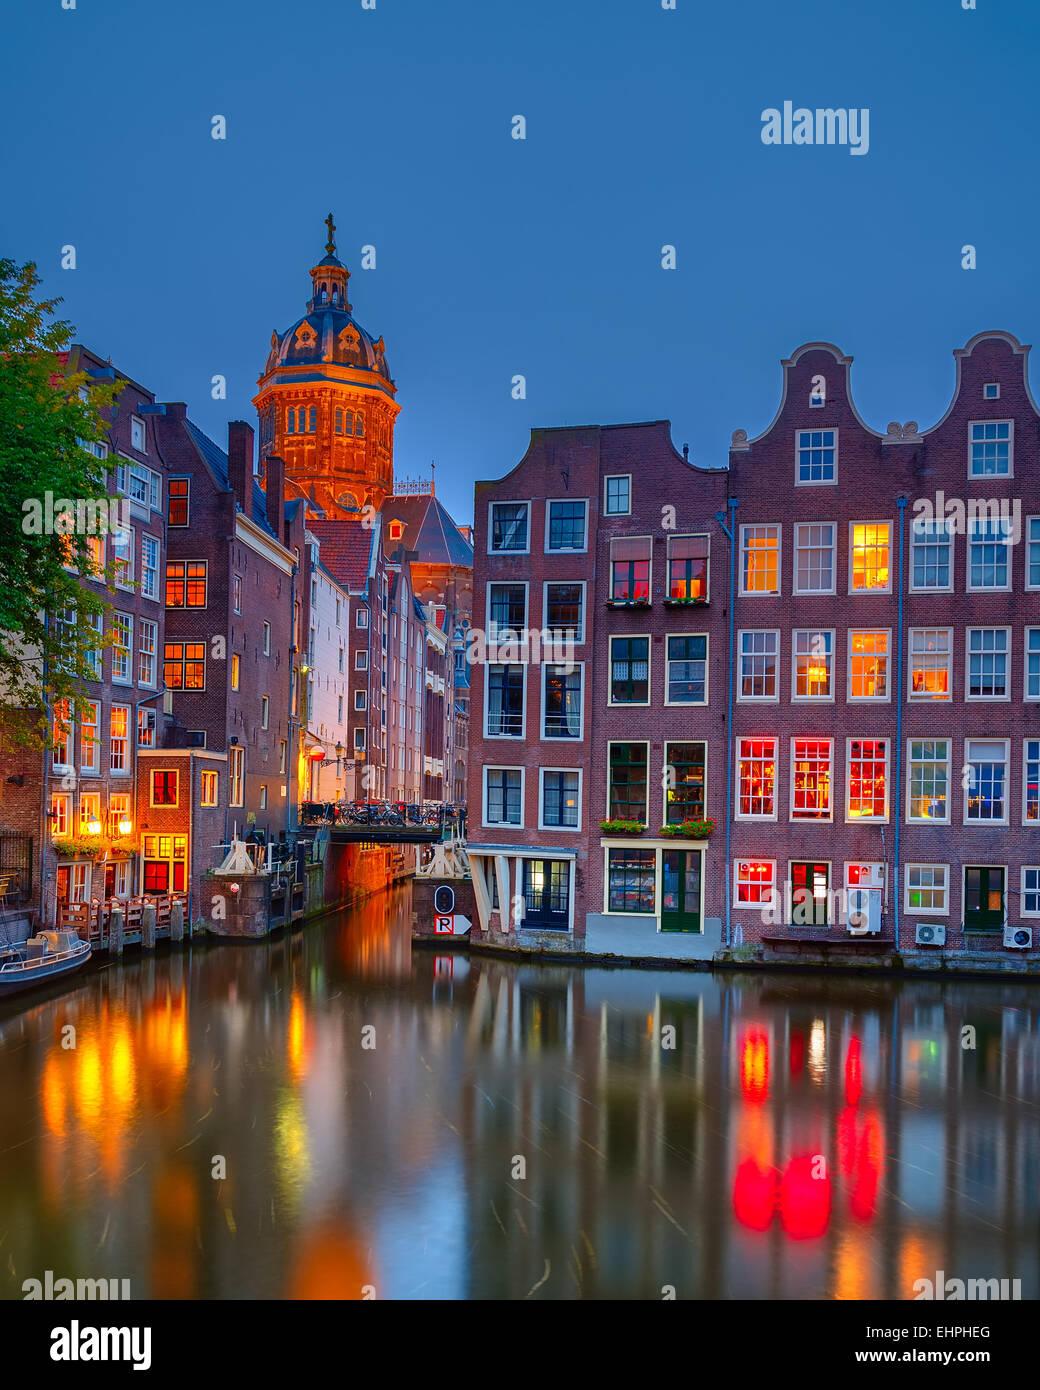 Amsterdam at night - Stock Image